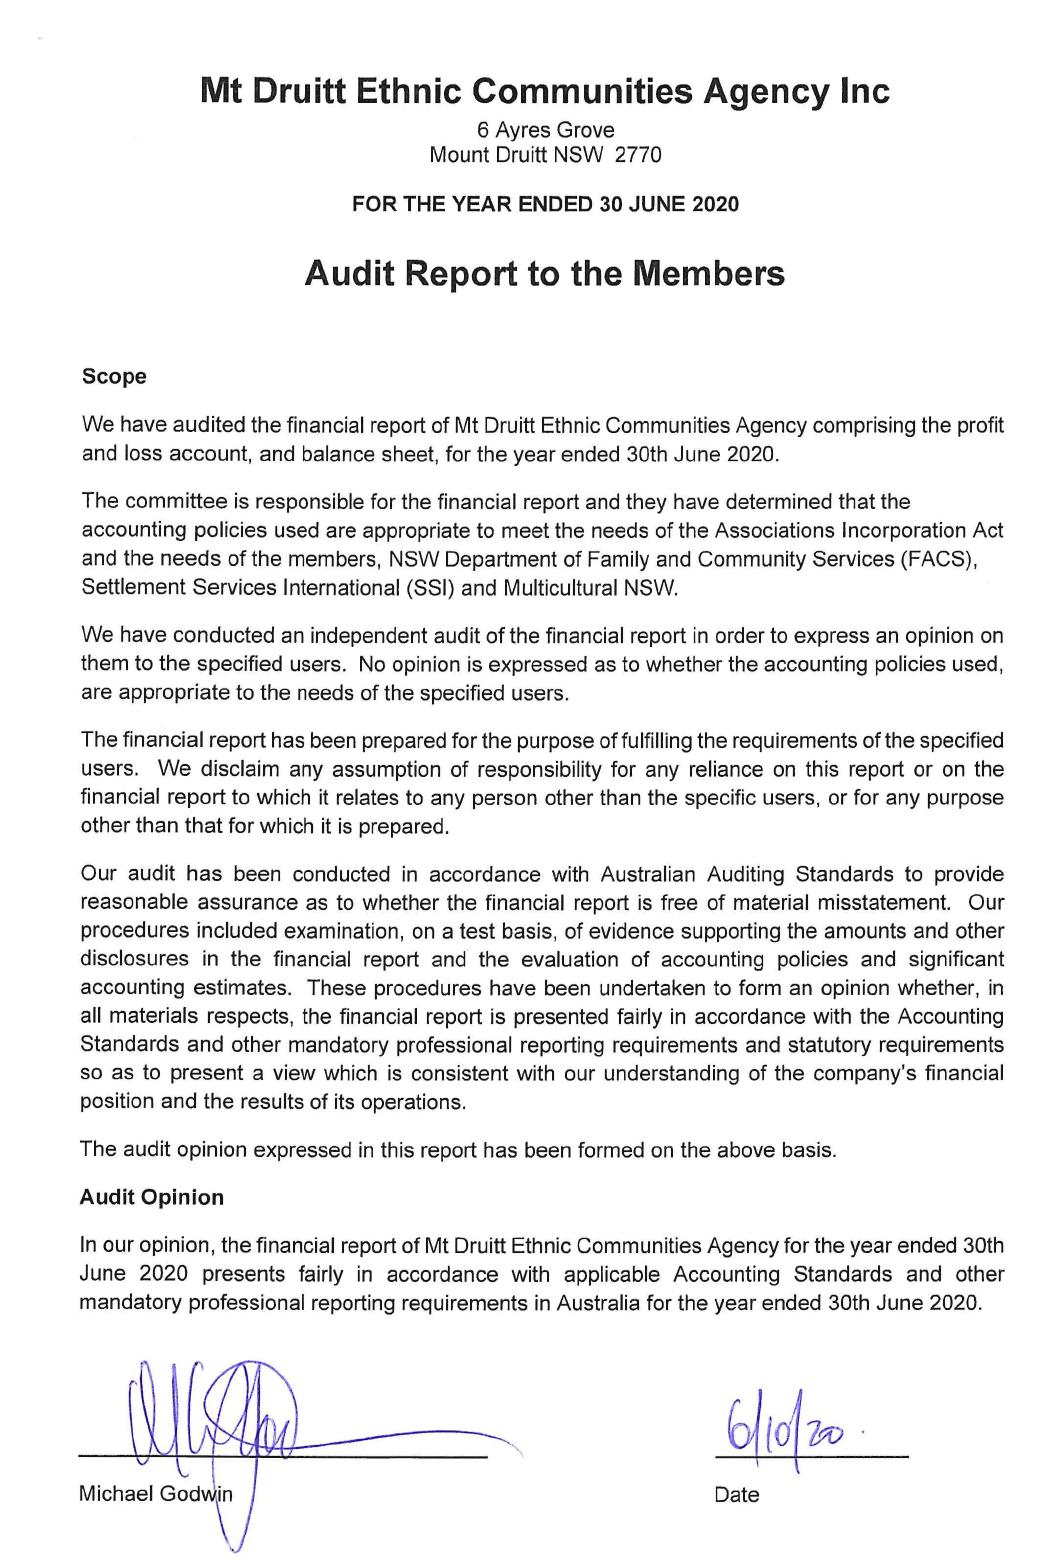 MECA Financial Report pg2